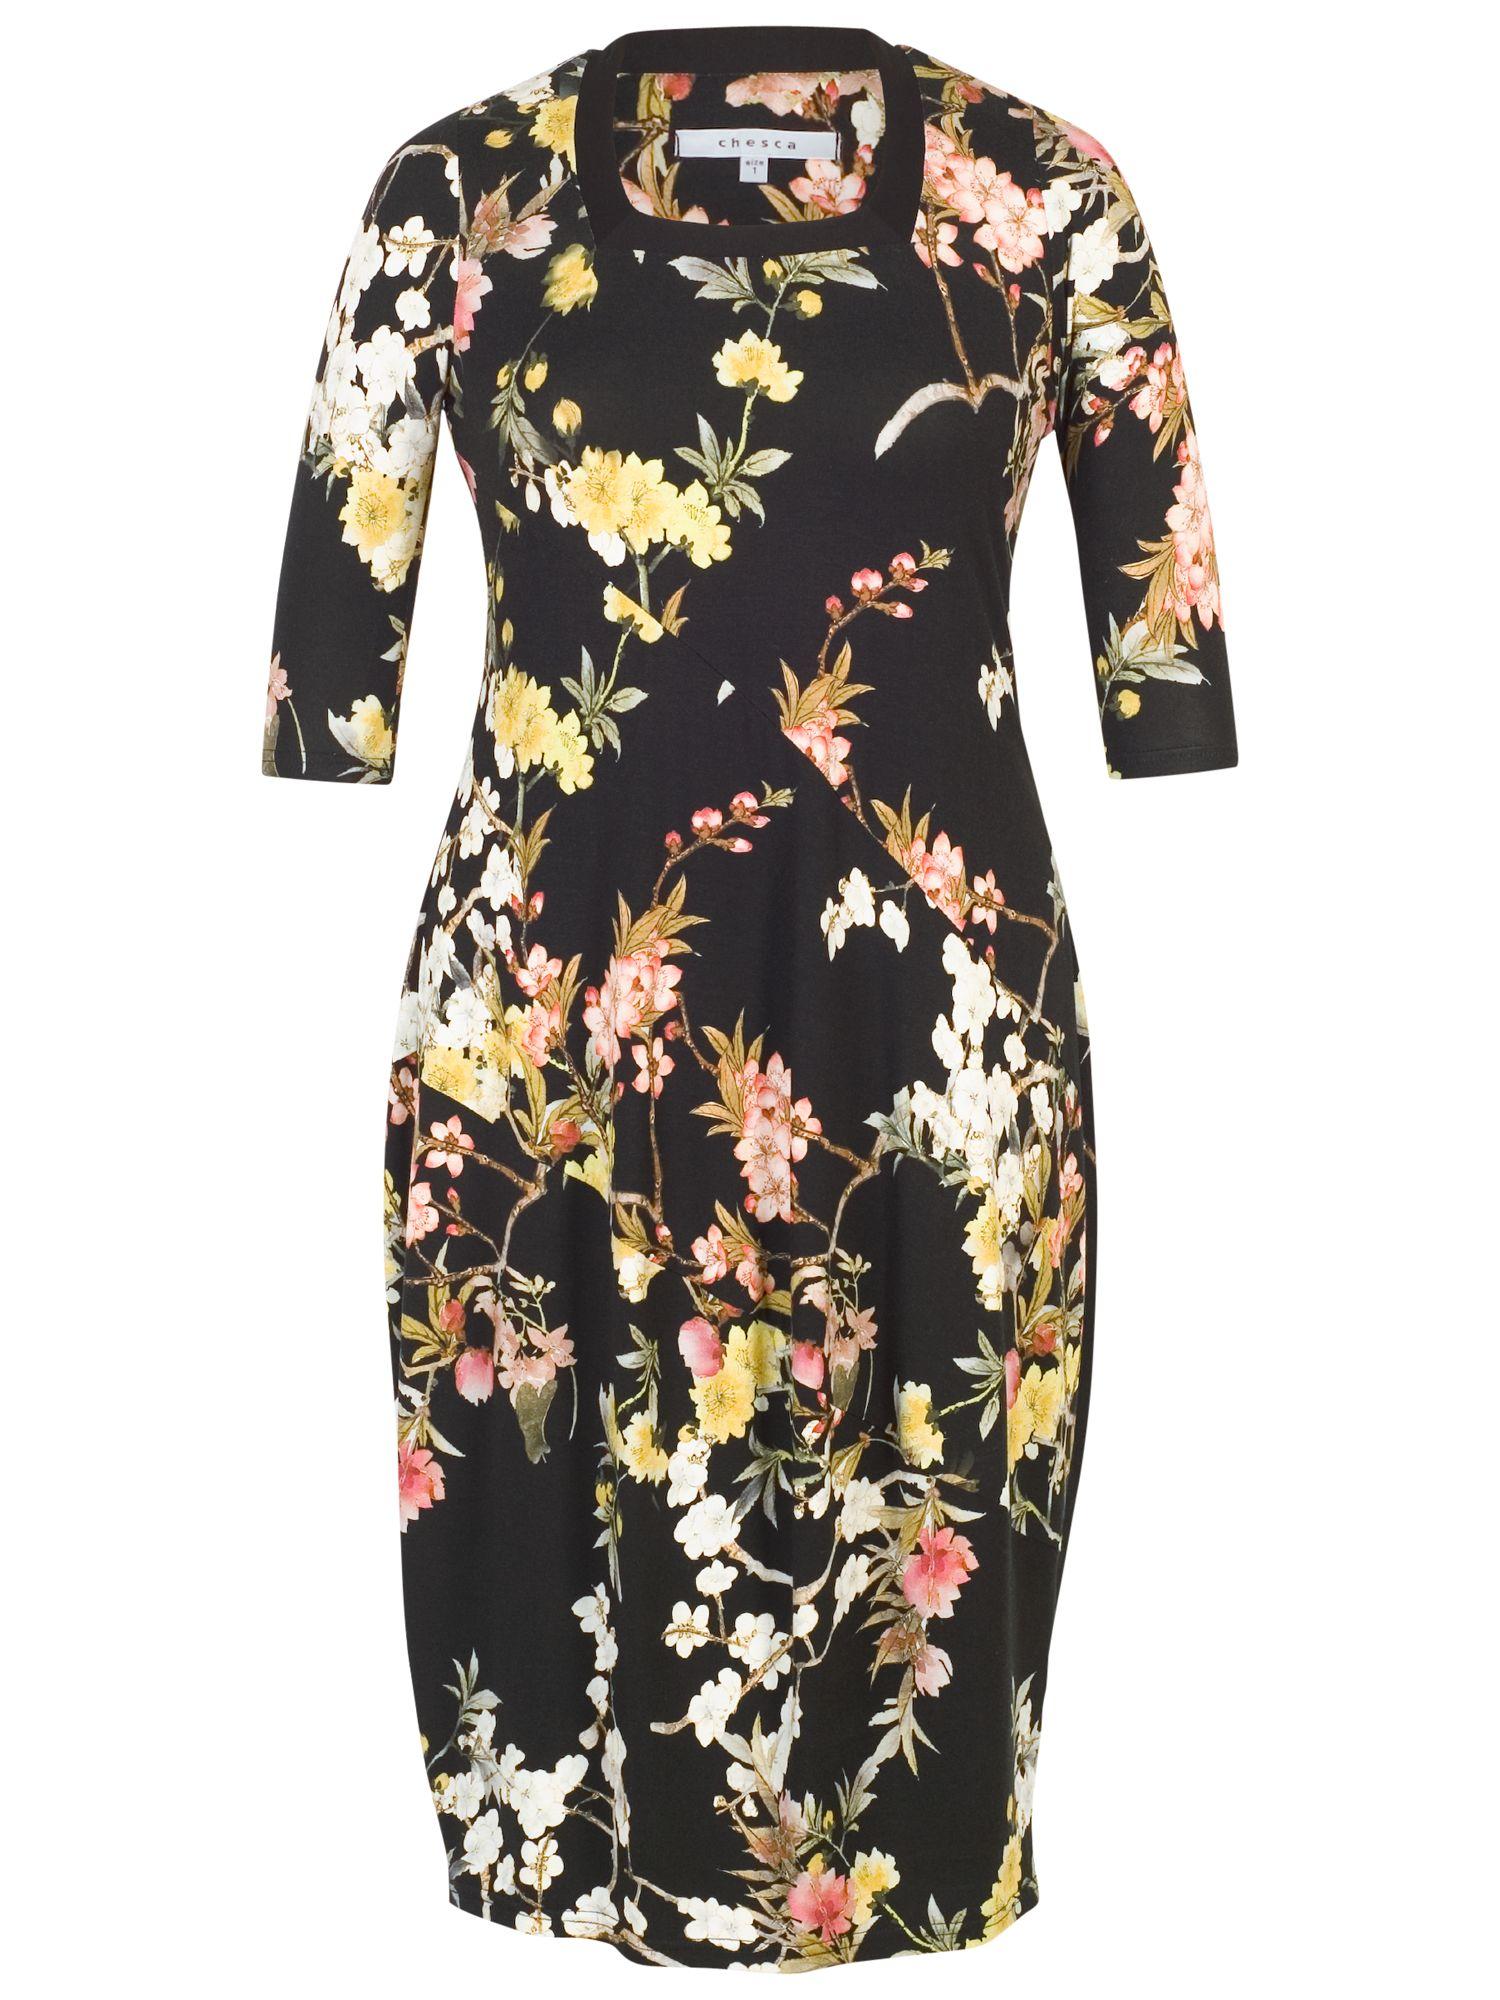 Chesca Chesca Oriental Floral Dress, Black